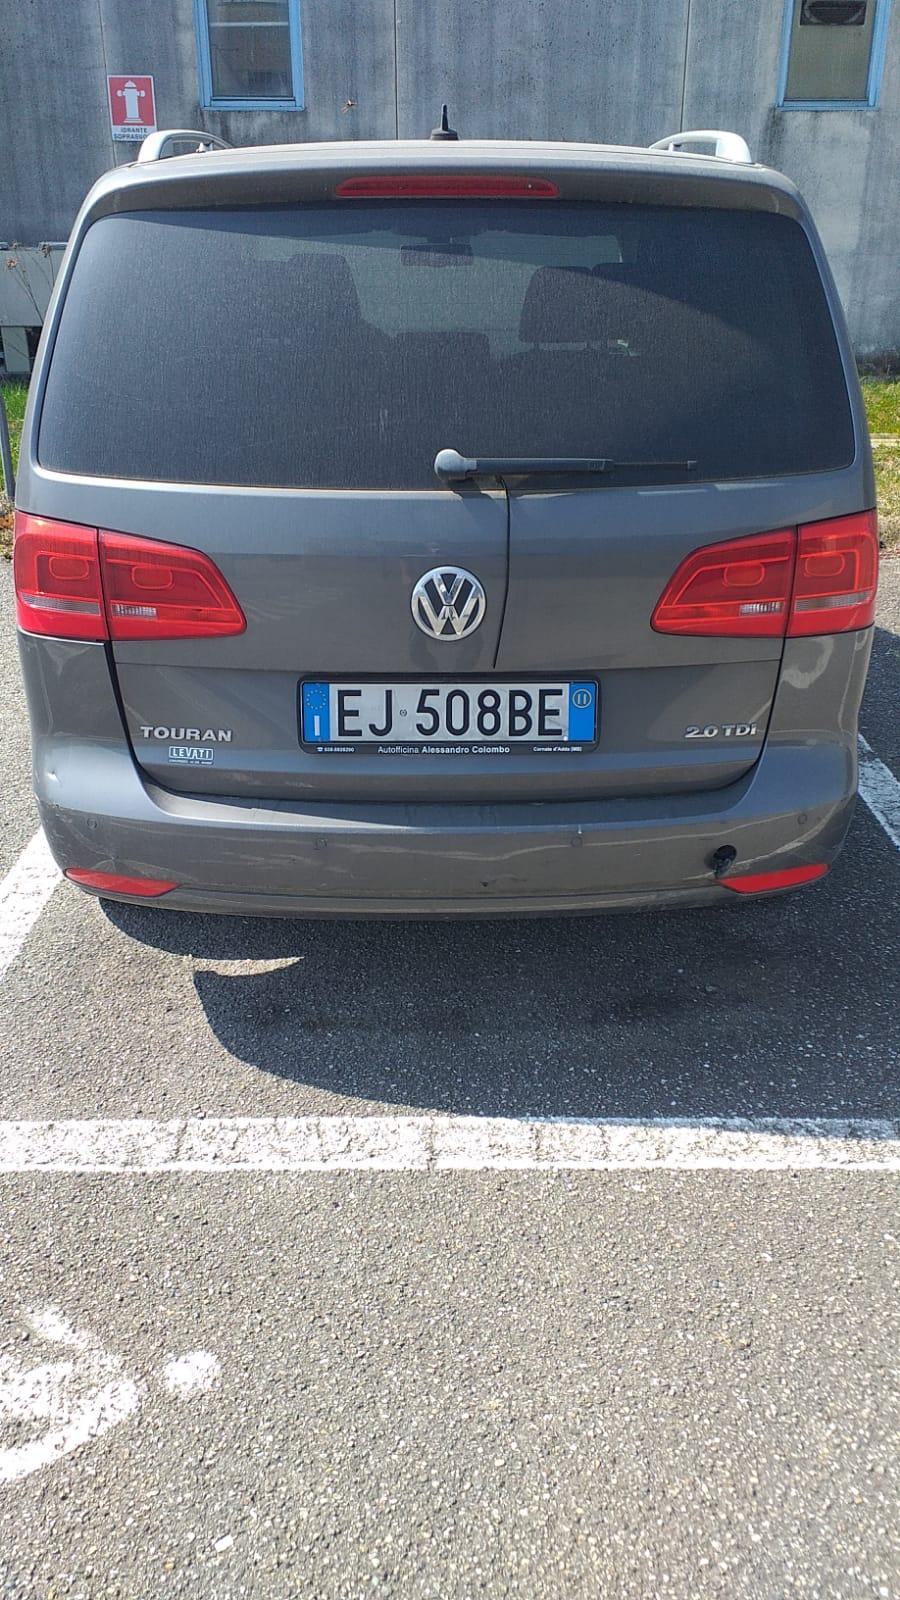 AUTOVETTURA VW TOURAN in vendita - foto 2